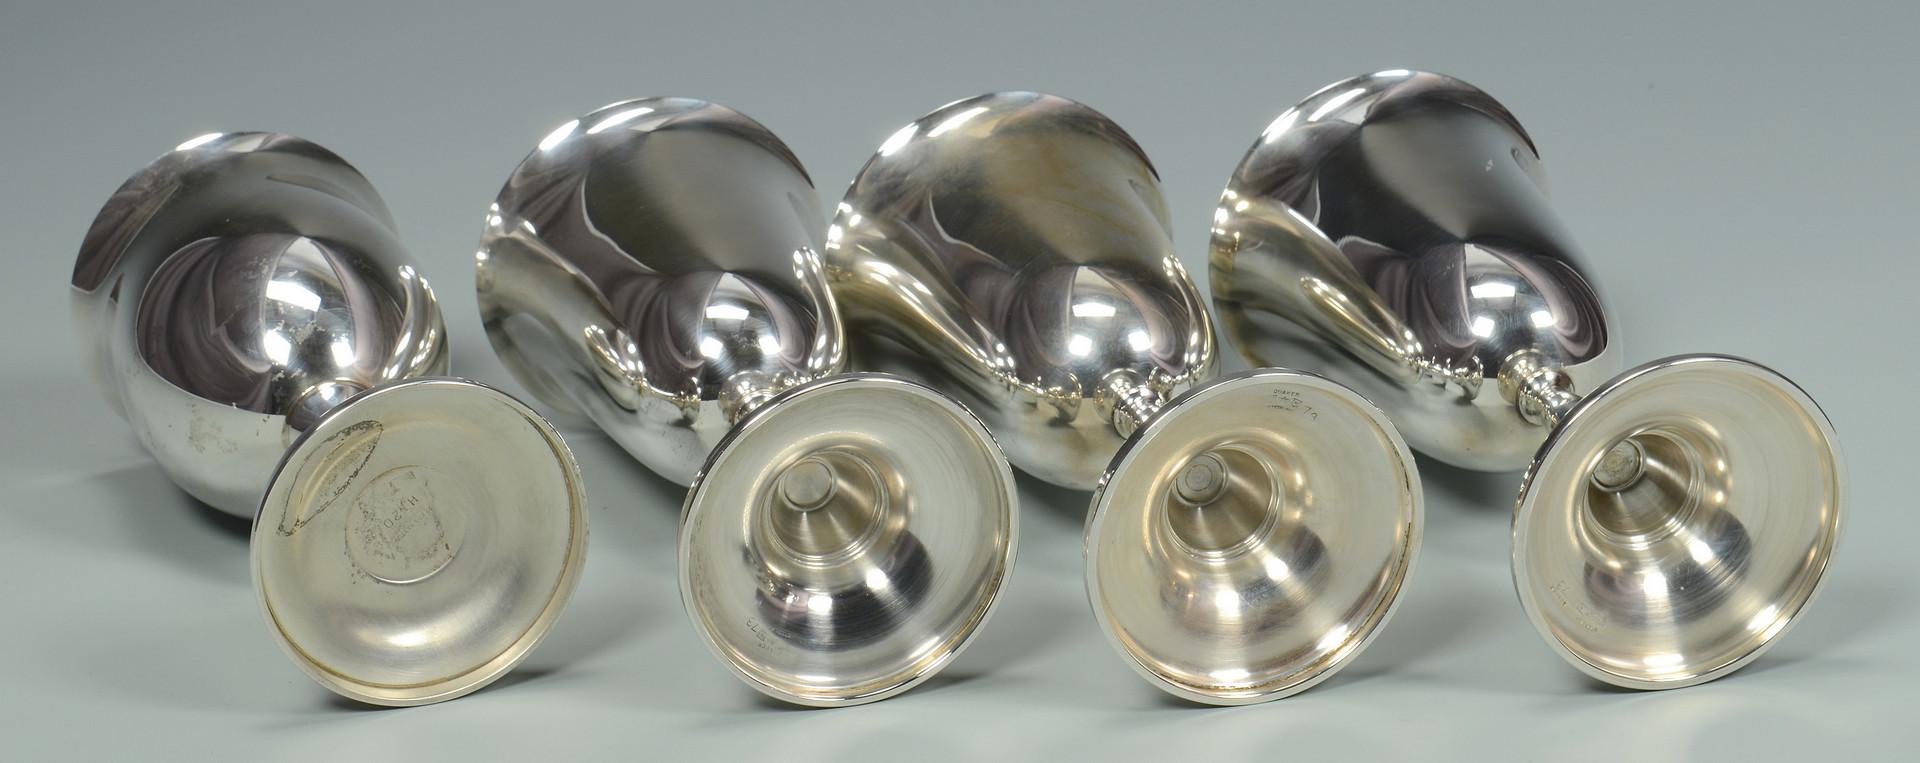 Lot 609: 4 Sterling Silver Goblets